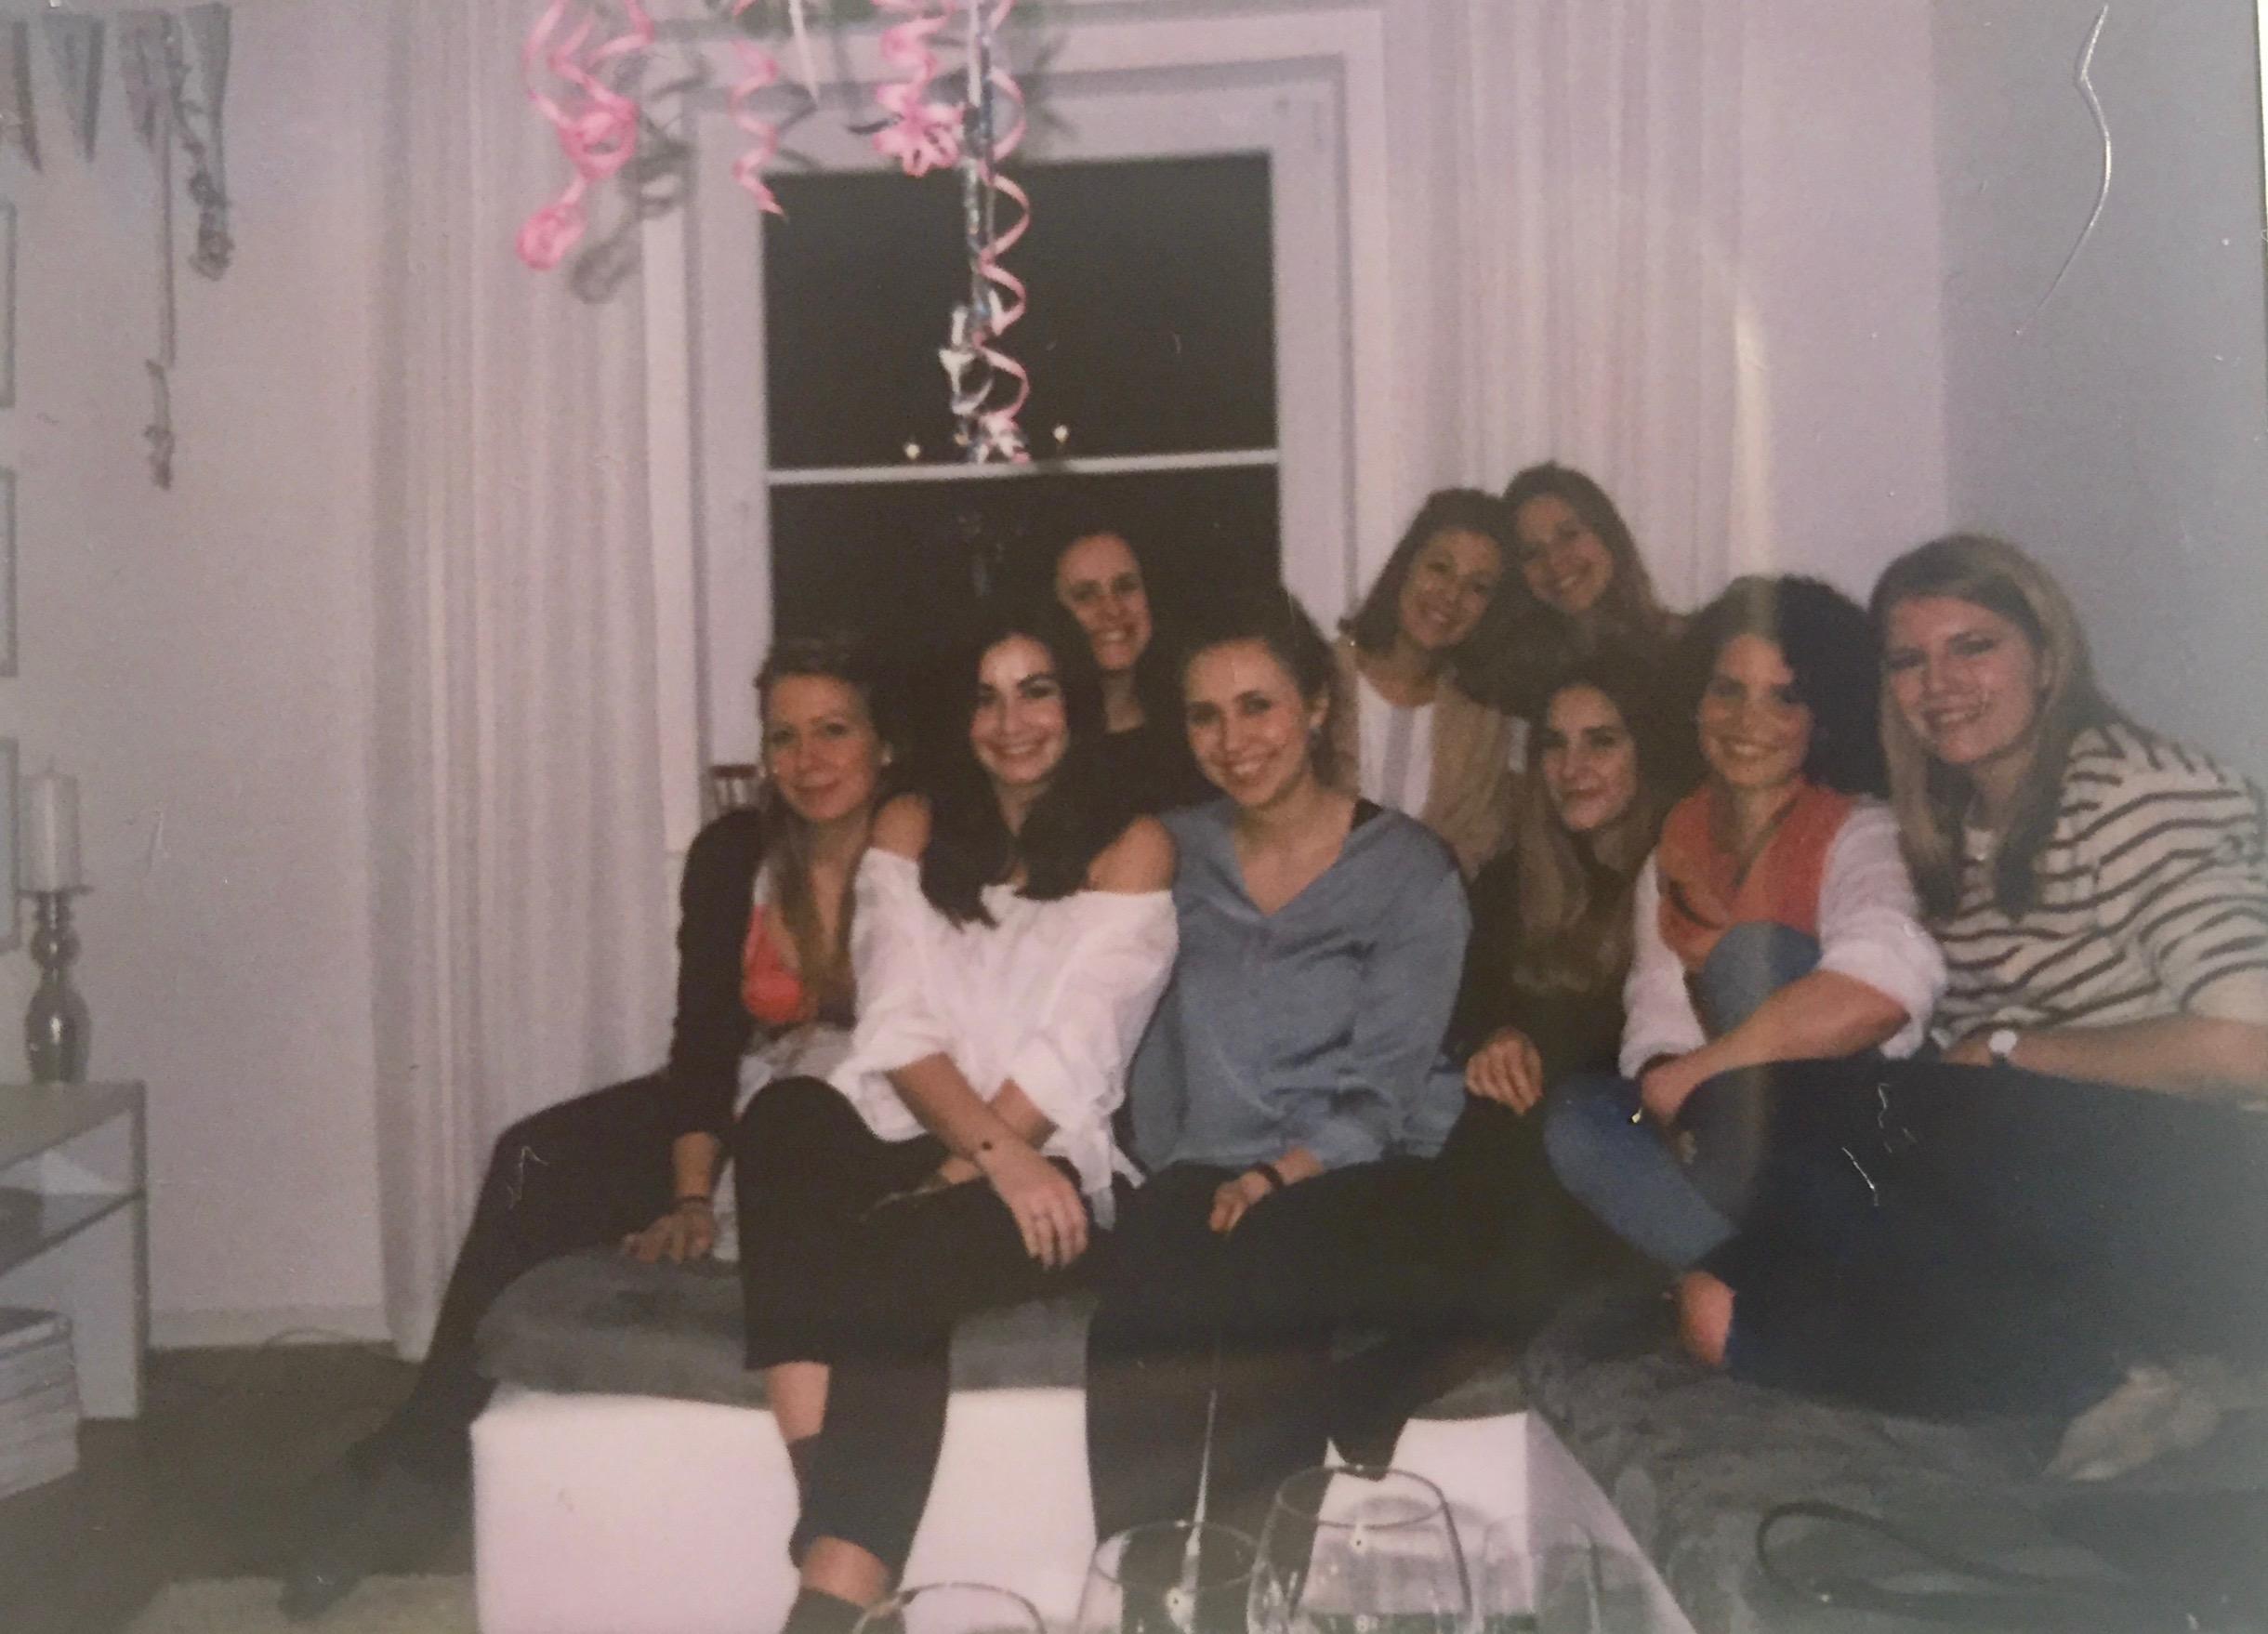 24th birthday, Geburtstag, home, party, friends, girls